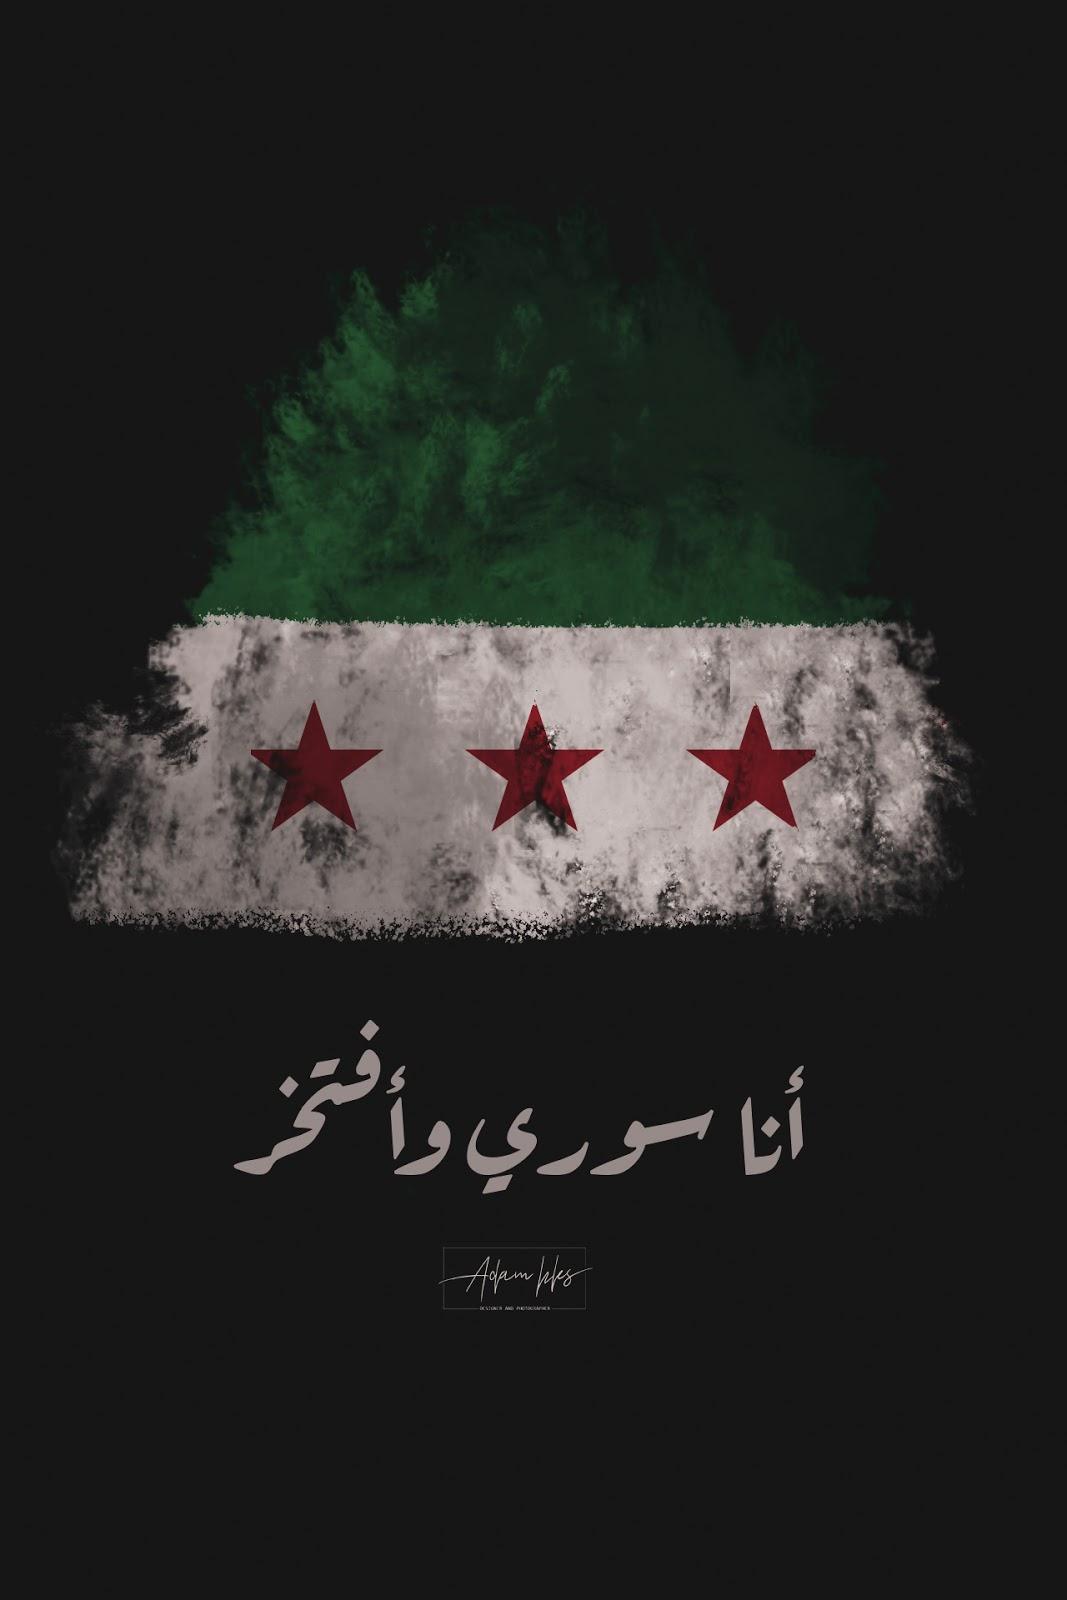 أنا سوري وأفتخر